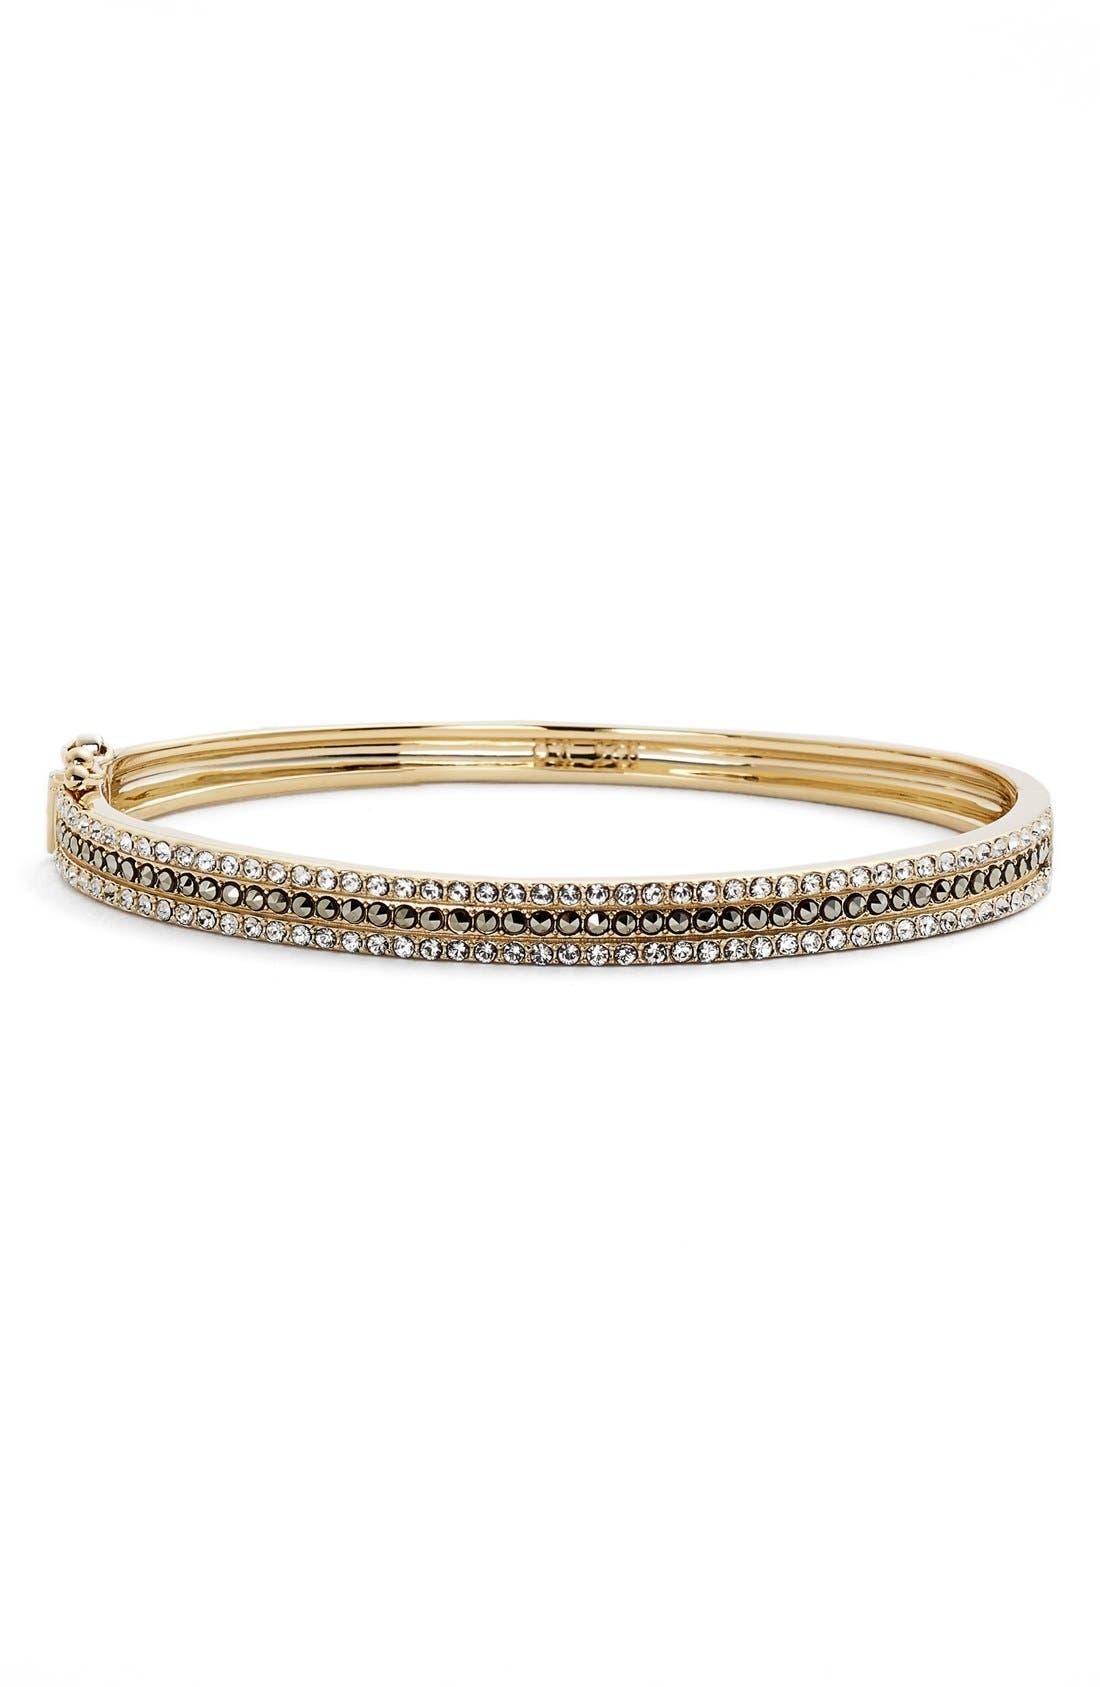 Three Row Bangle Bracelet,                             Main thumbnail 1, color,                             Gold